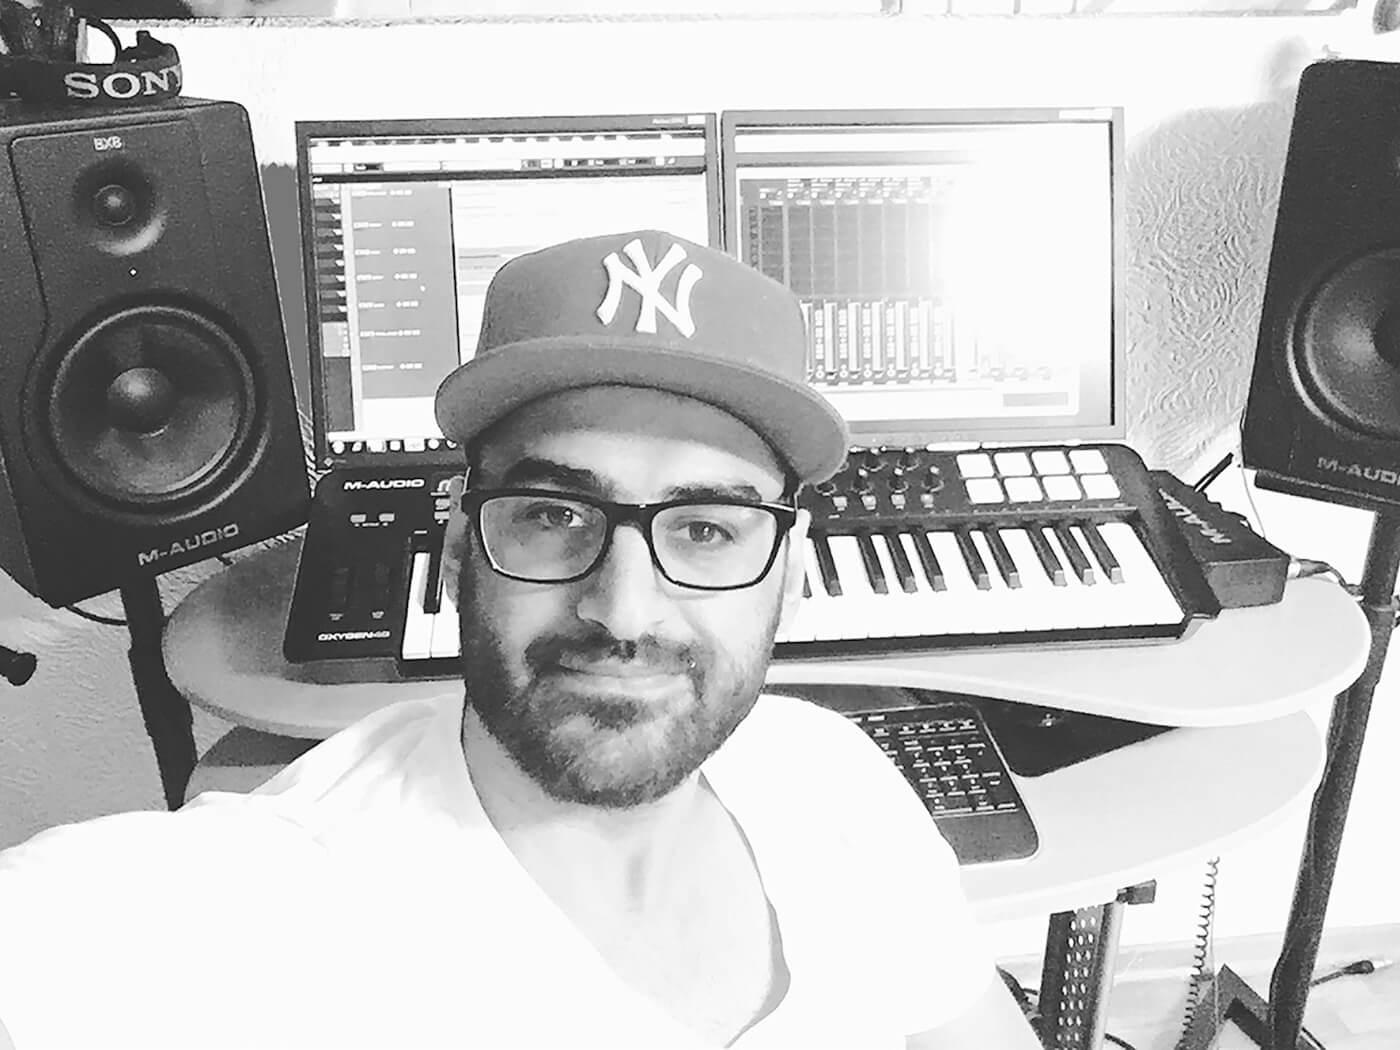 Studio Interview: KomayAlshoufi